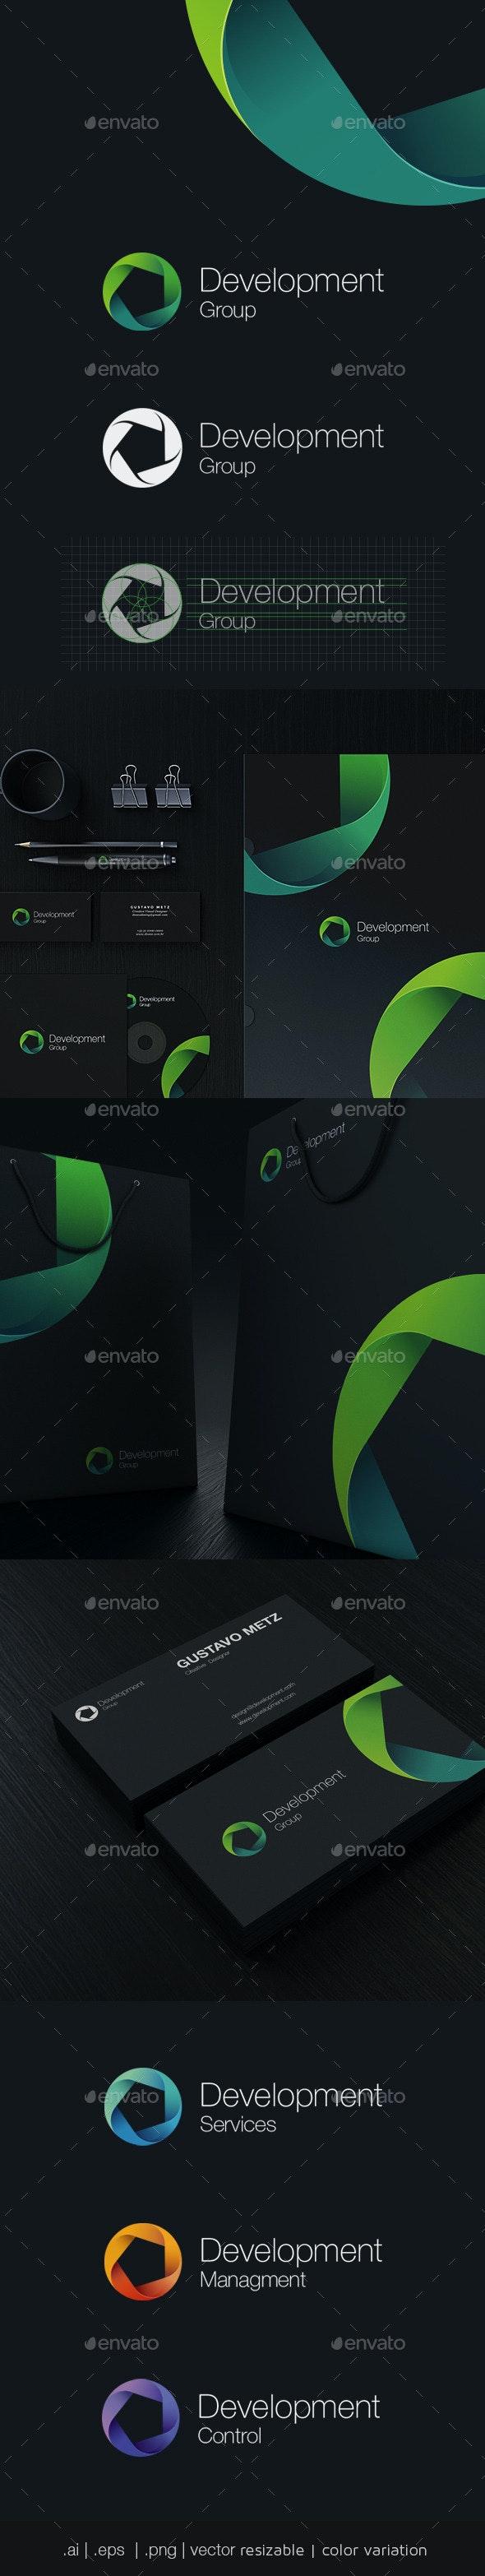 Development Group Logo Template - Vector Abstract